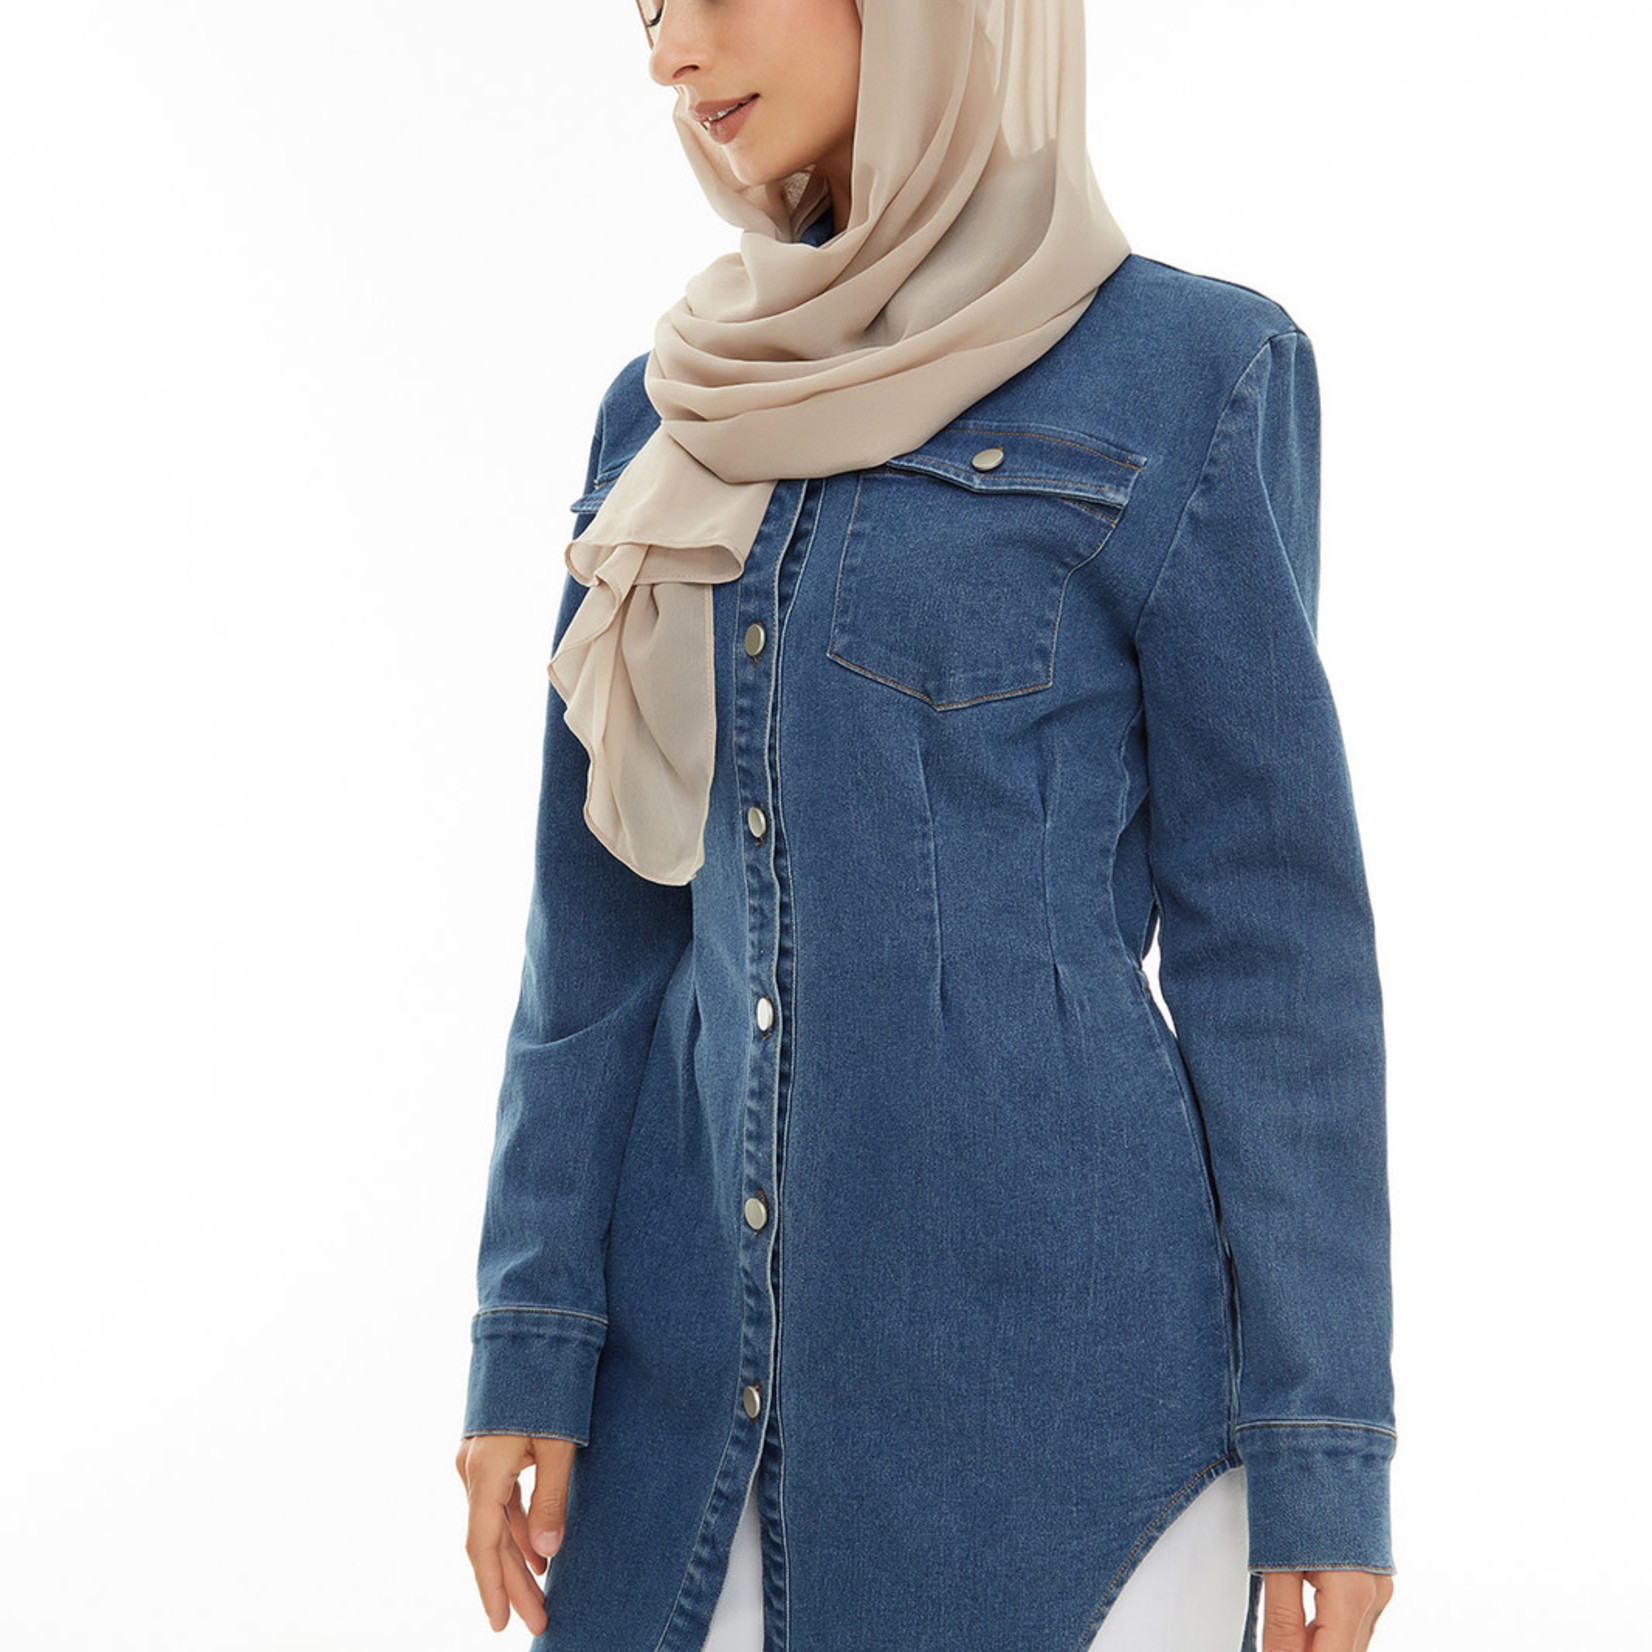 Hijab House Cinched waist denim shirt